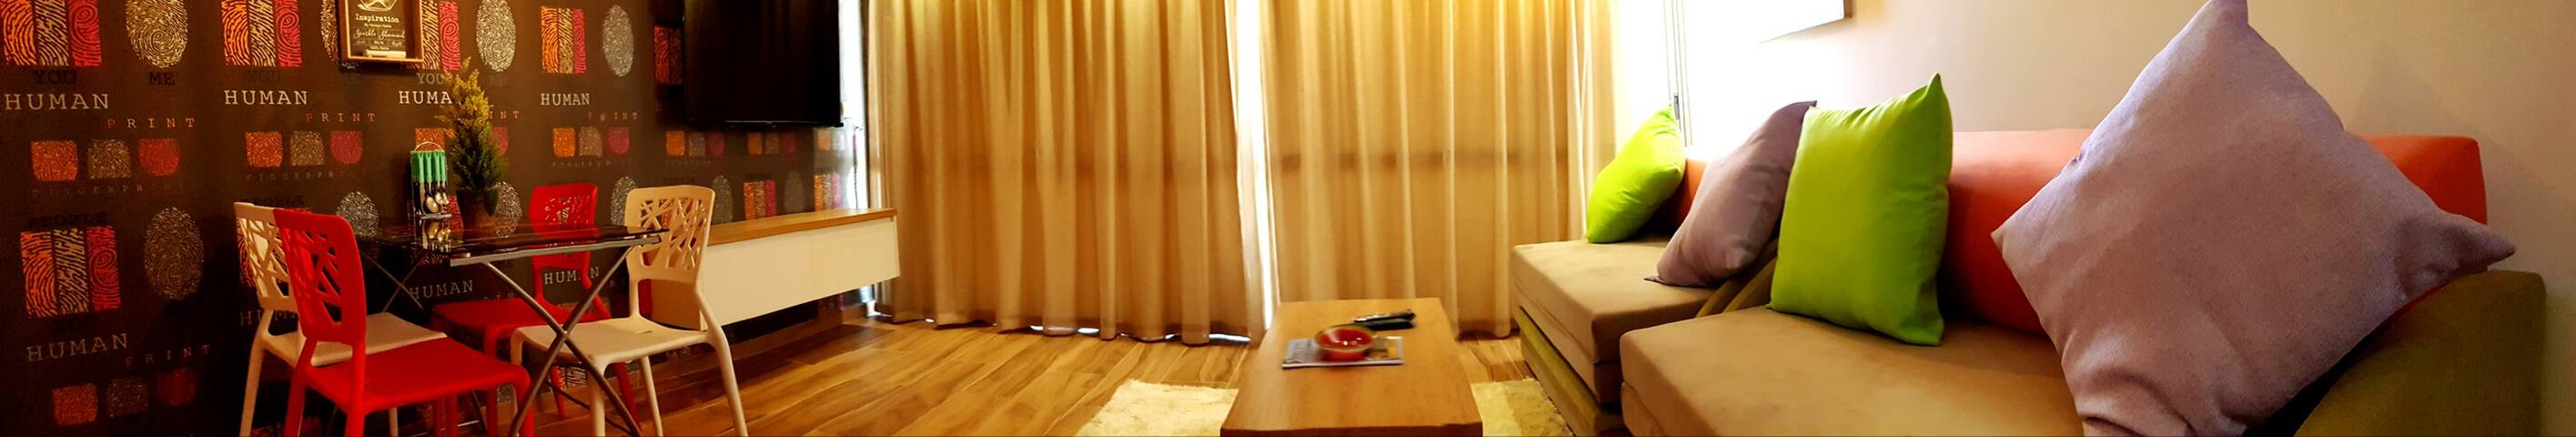 Luxury Apartment Living Room - City Apartments